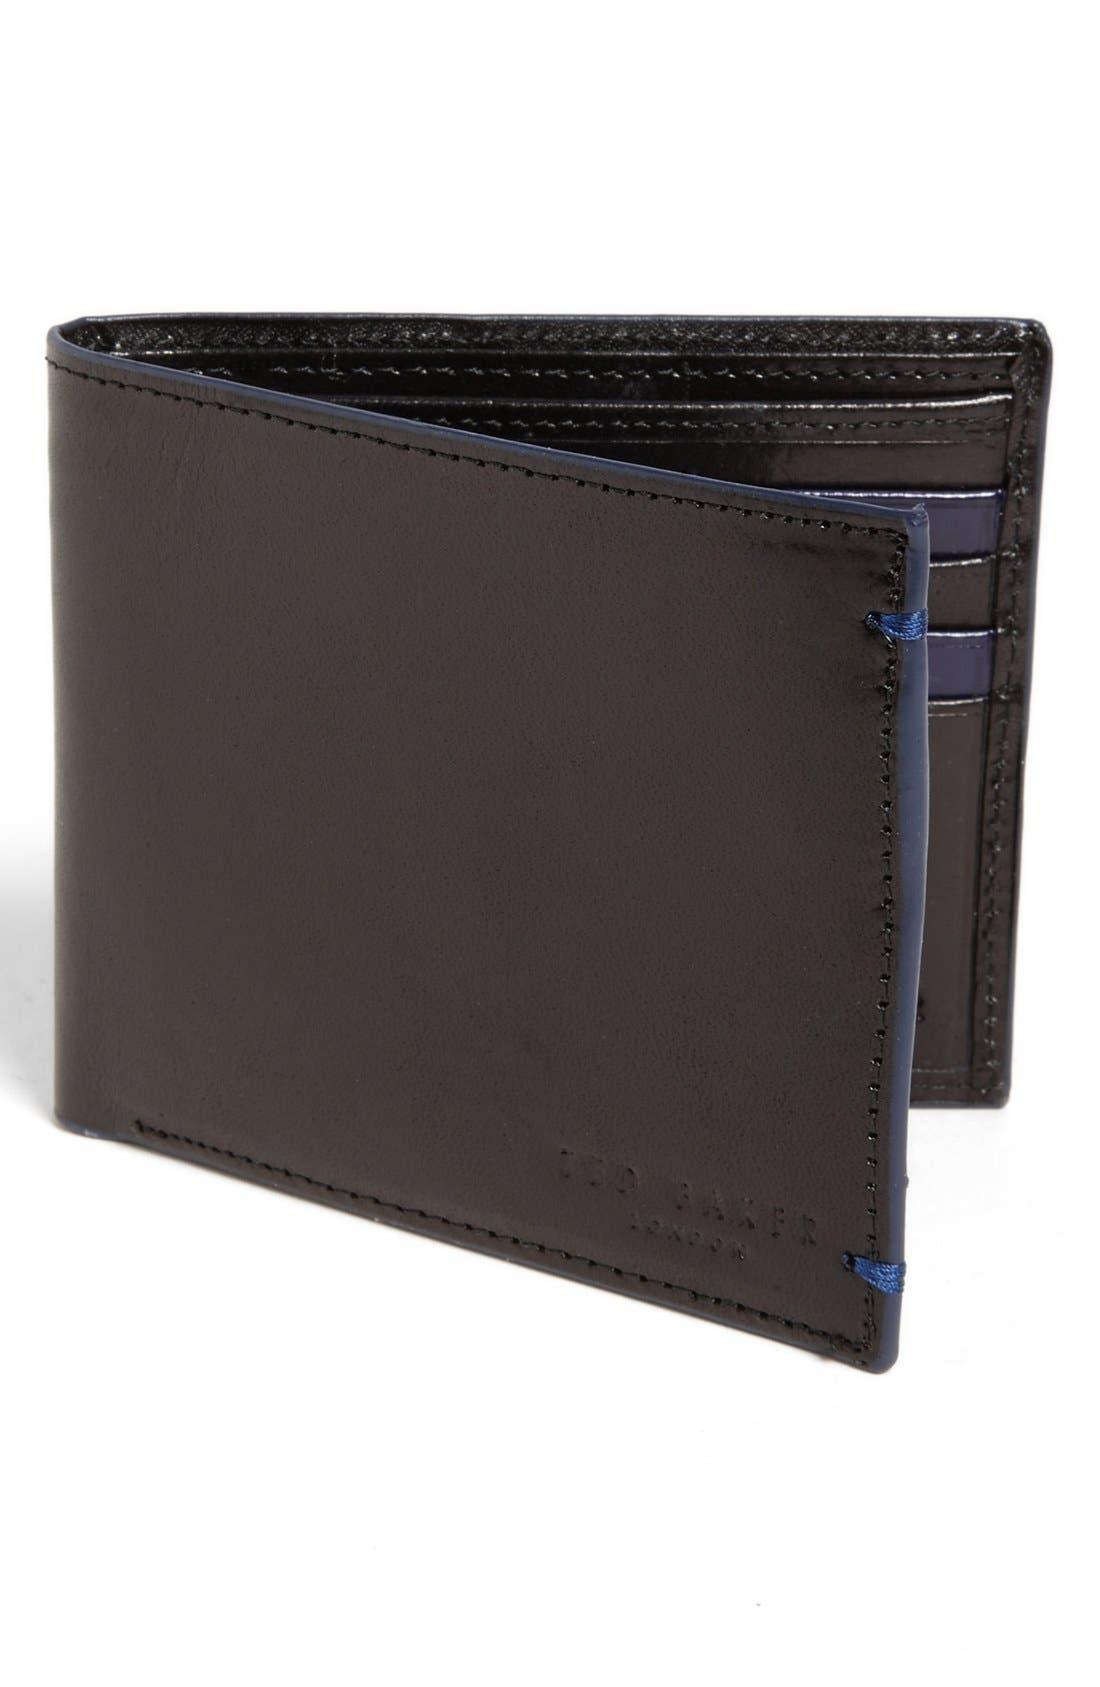 Alternate Image 1 Selected - Ted Baker London 'Claudis' Wallet